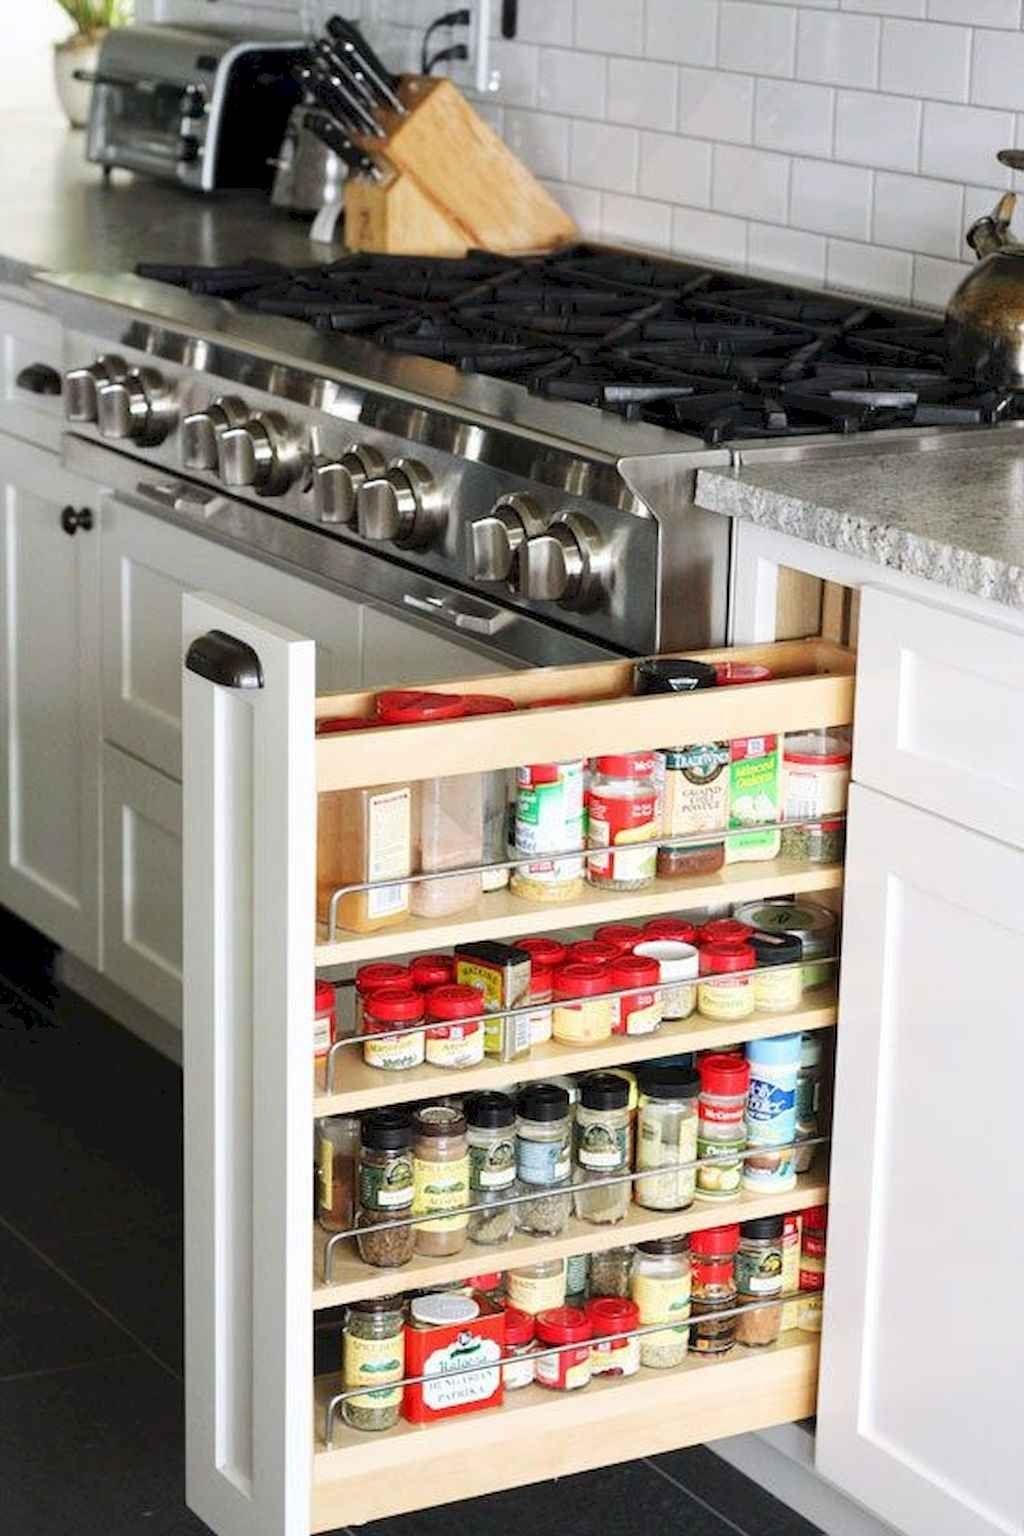 100 elegant white kitchen cabinets decor ideas for farmhouse style design in 2020 kitchen on kitchen organization elegant id=60656